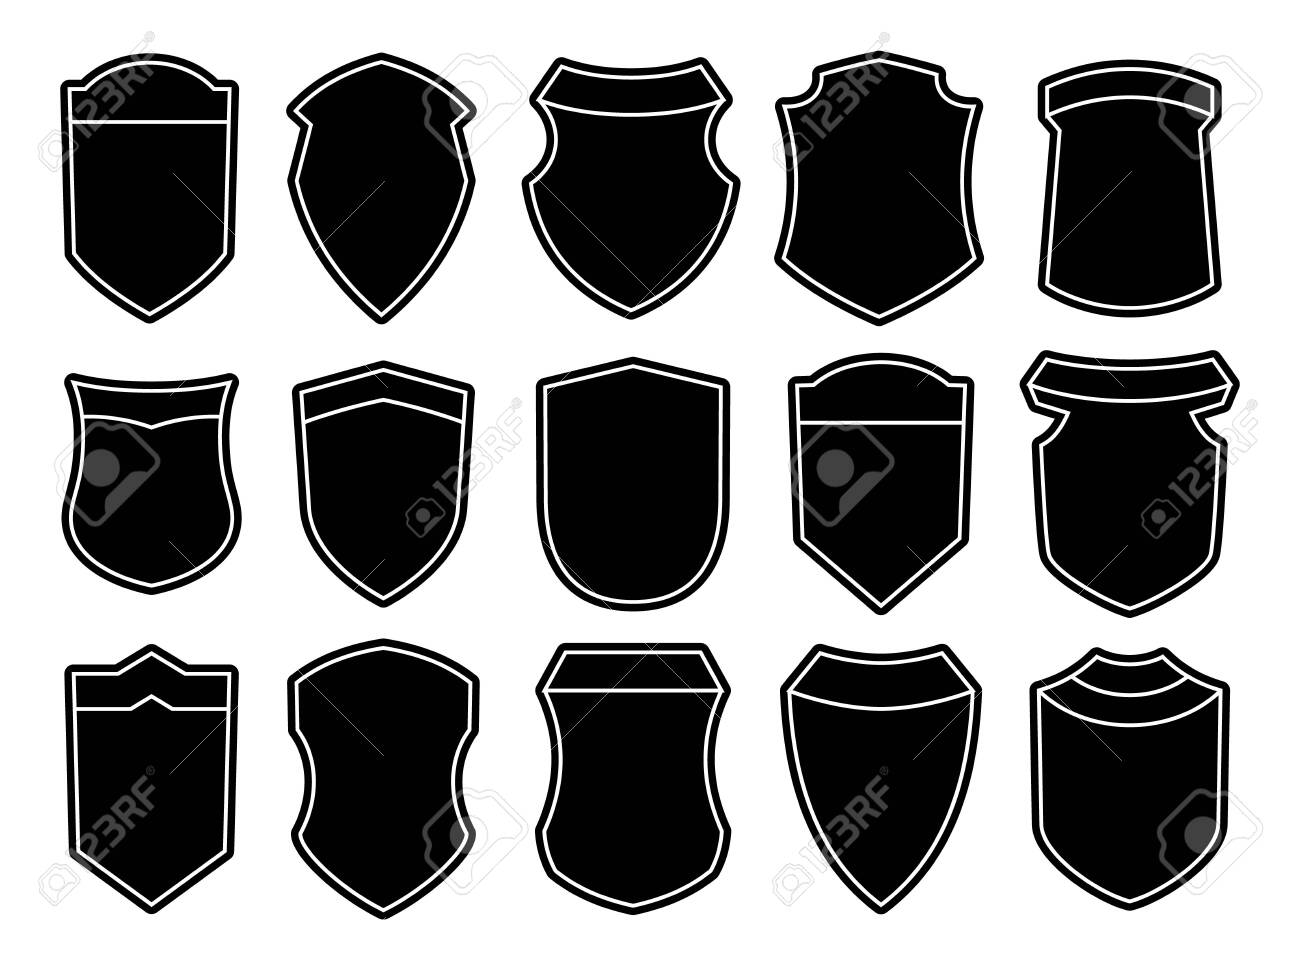 Set of blank empty dark shields. Black badge shapes. Vintage heraldic banner shapes design. Retro style borders, frames, labels - 138982164